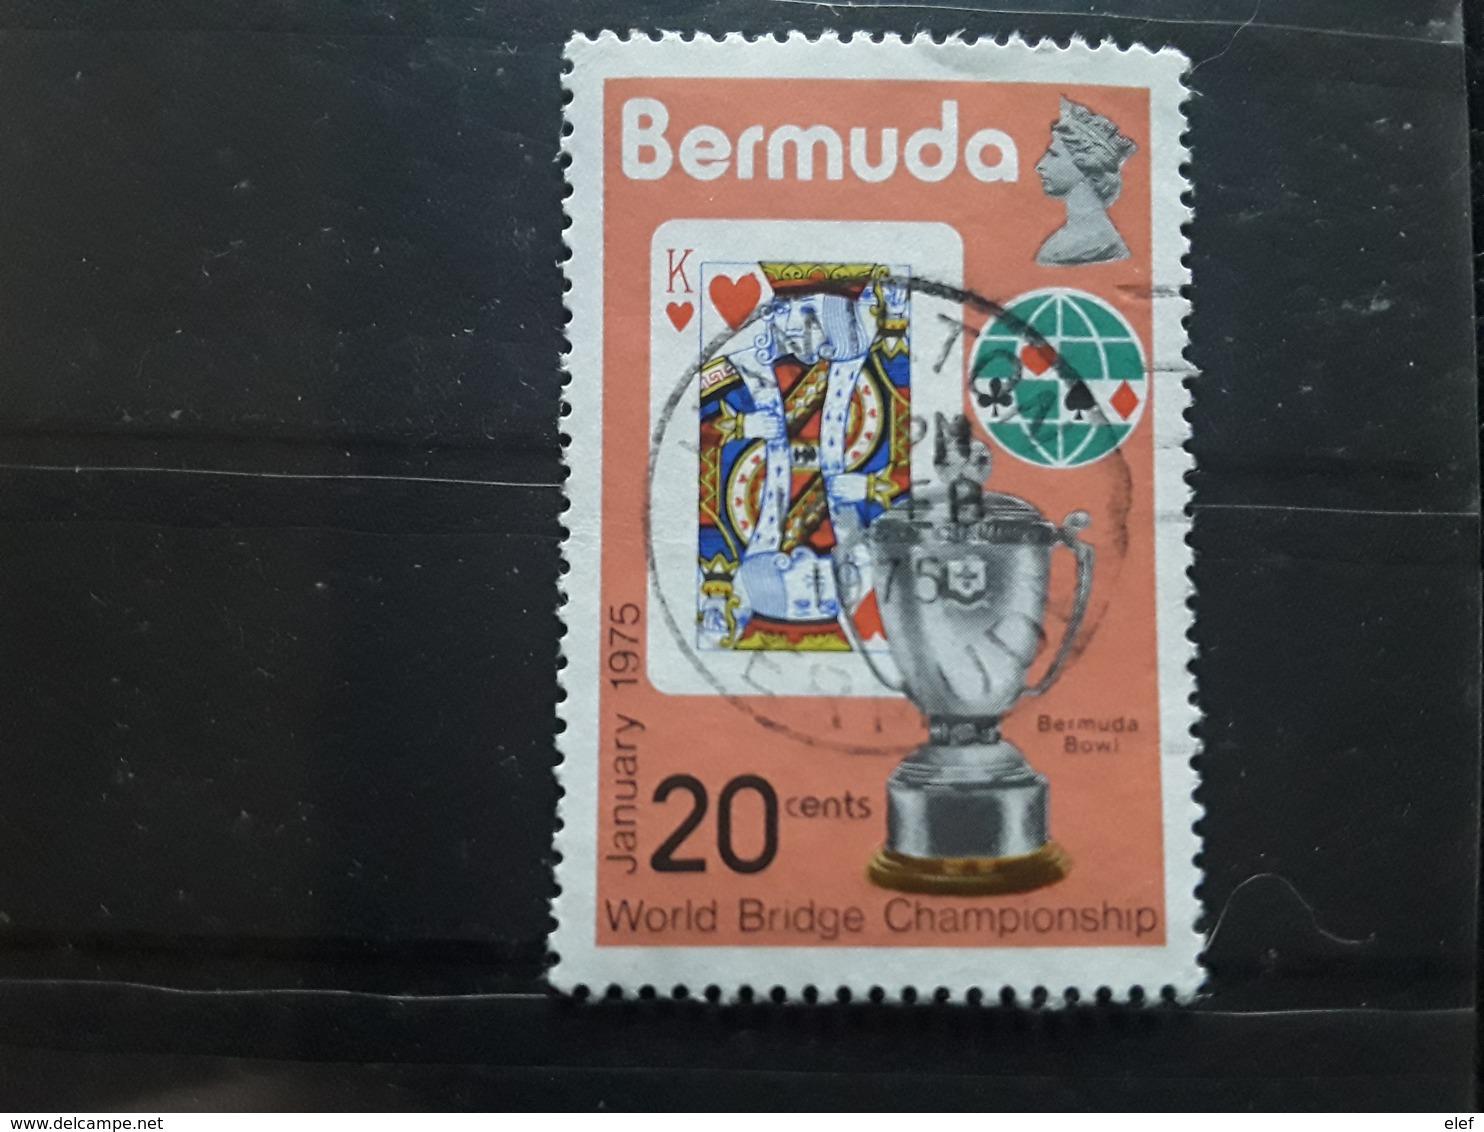 BERMUDA / Bermudes Queen Elisabeth II , Jeu De Cartes World Bridge Championship Playing Cards, Bermuda Bowl, 1975 Obl TB - Giochi